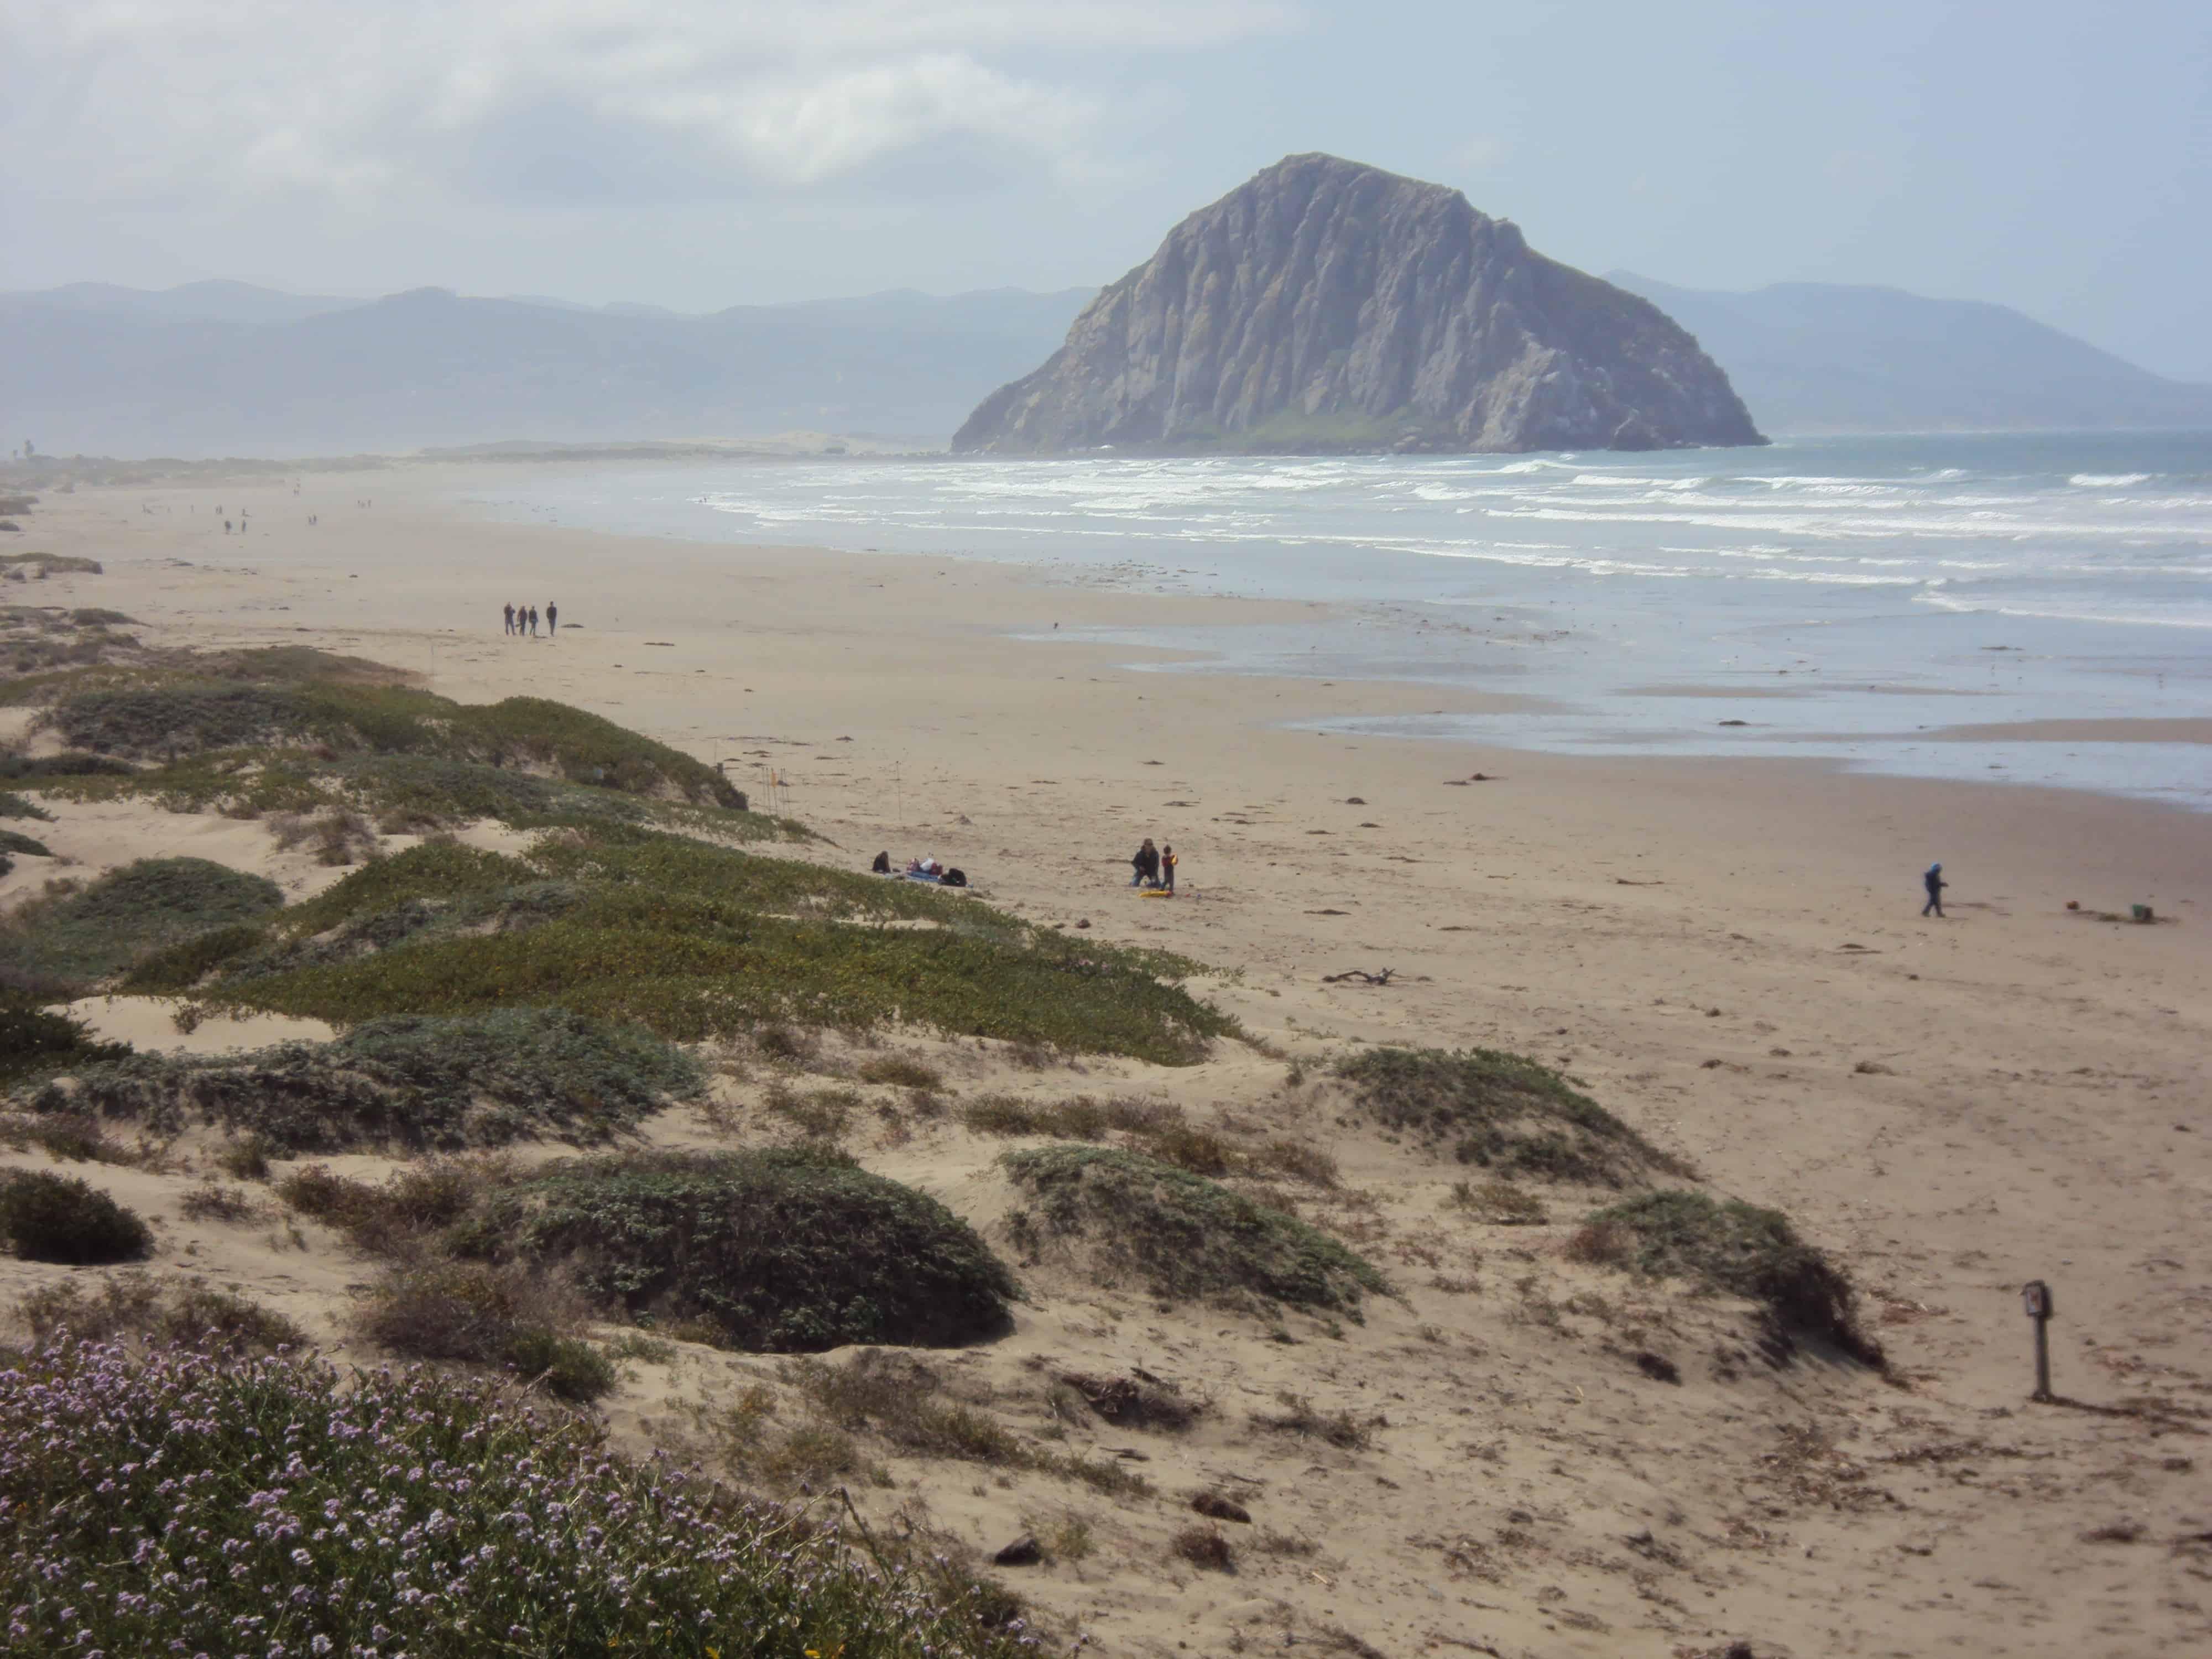 Morro Strand State Beach